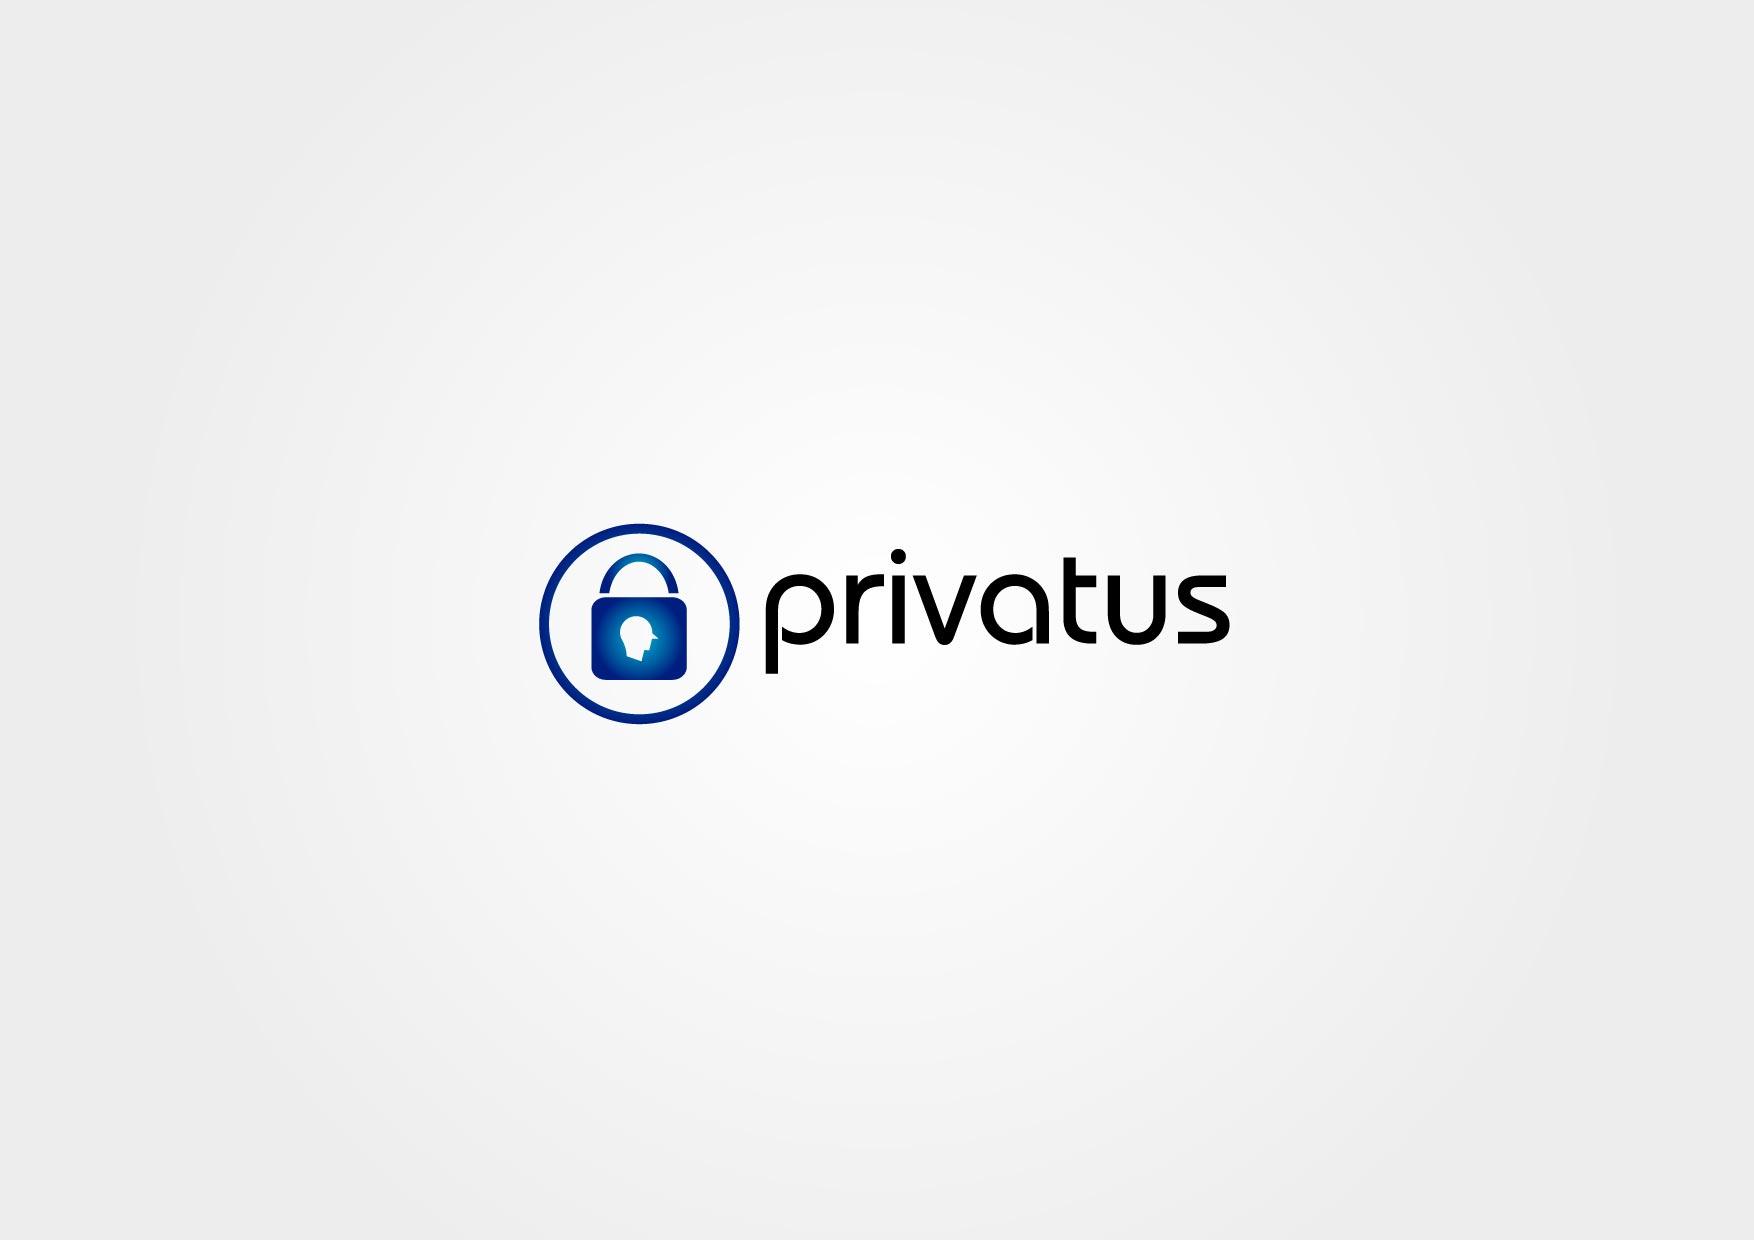 Logo Design by Osi Indra - Entry No. 14 in the Logo Design Contest New Logo Design for privatus.